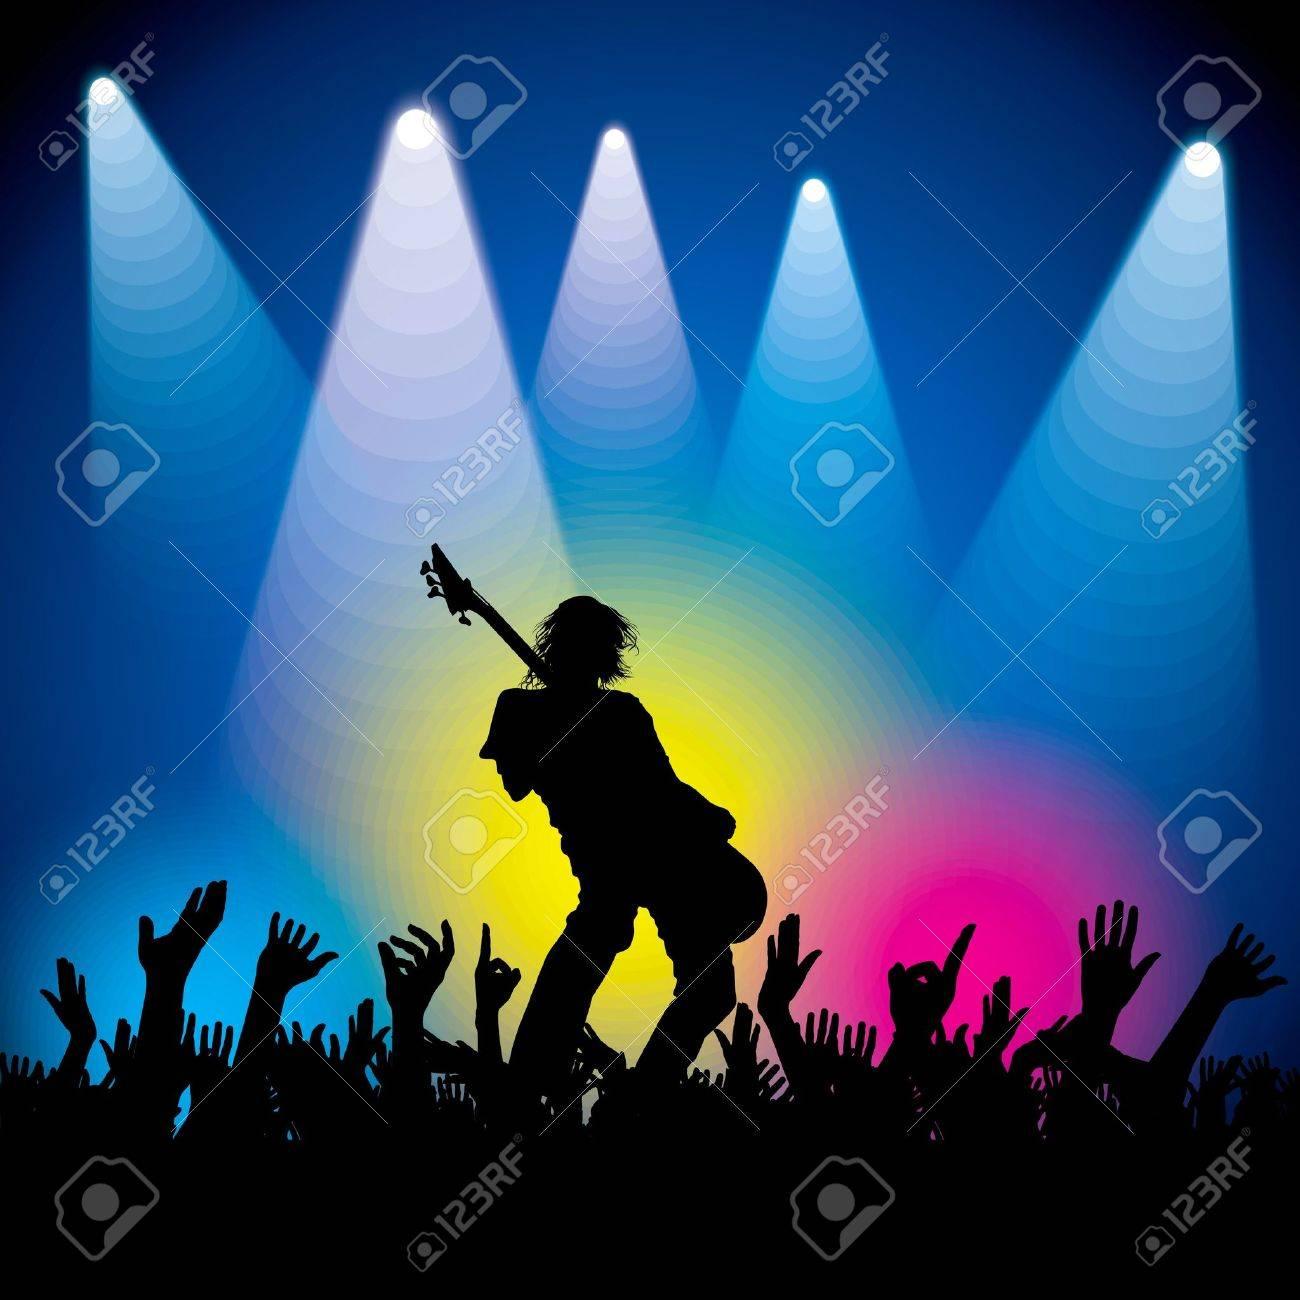 Pics photos rock concert background - Rock Music Musical Background Vector